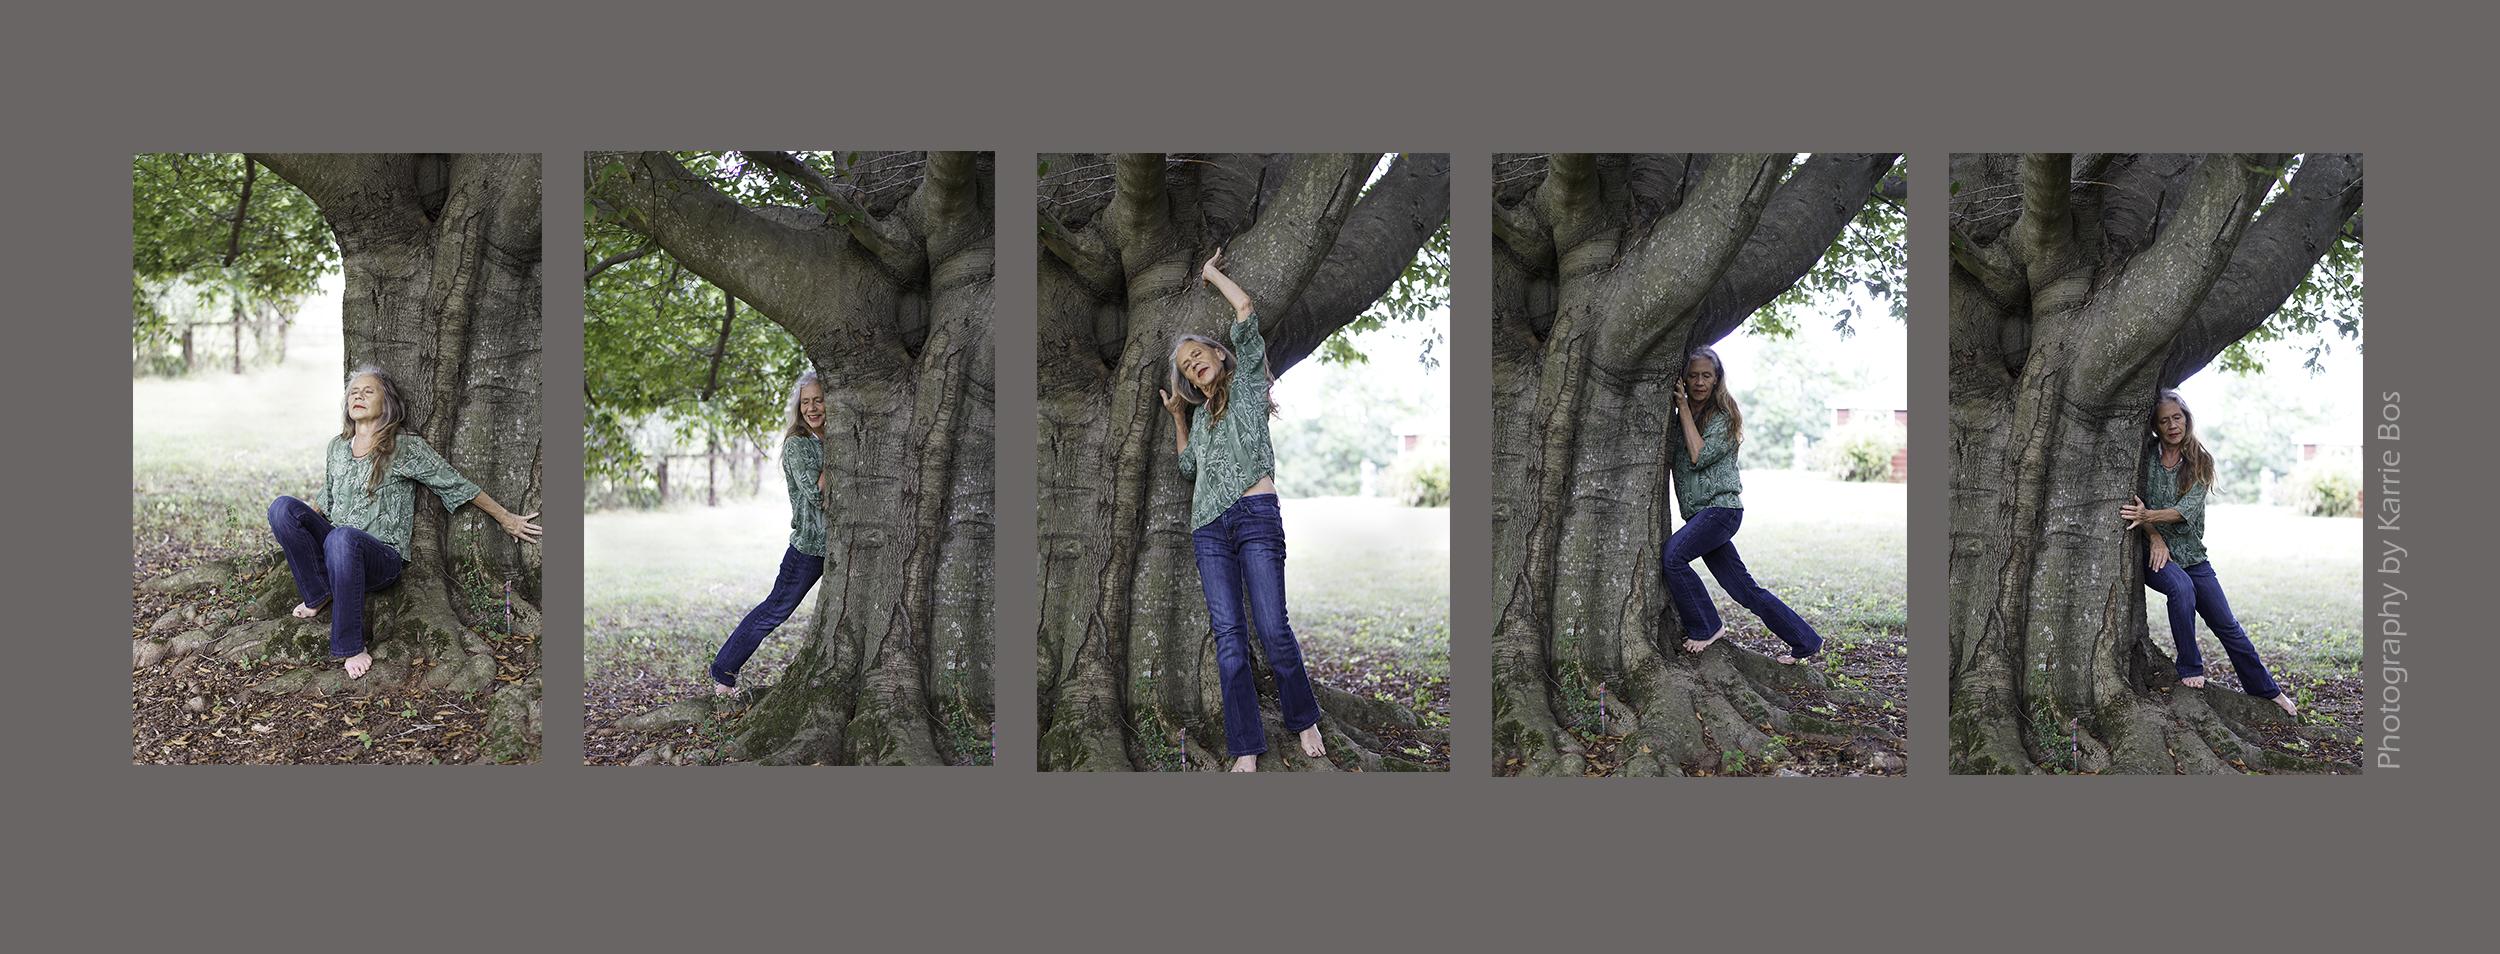 montage b.jpg